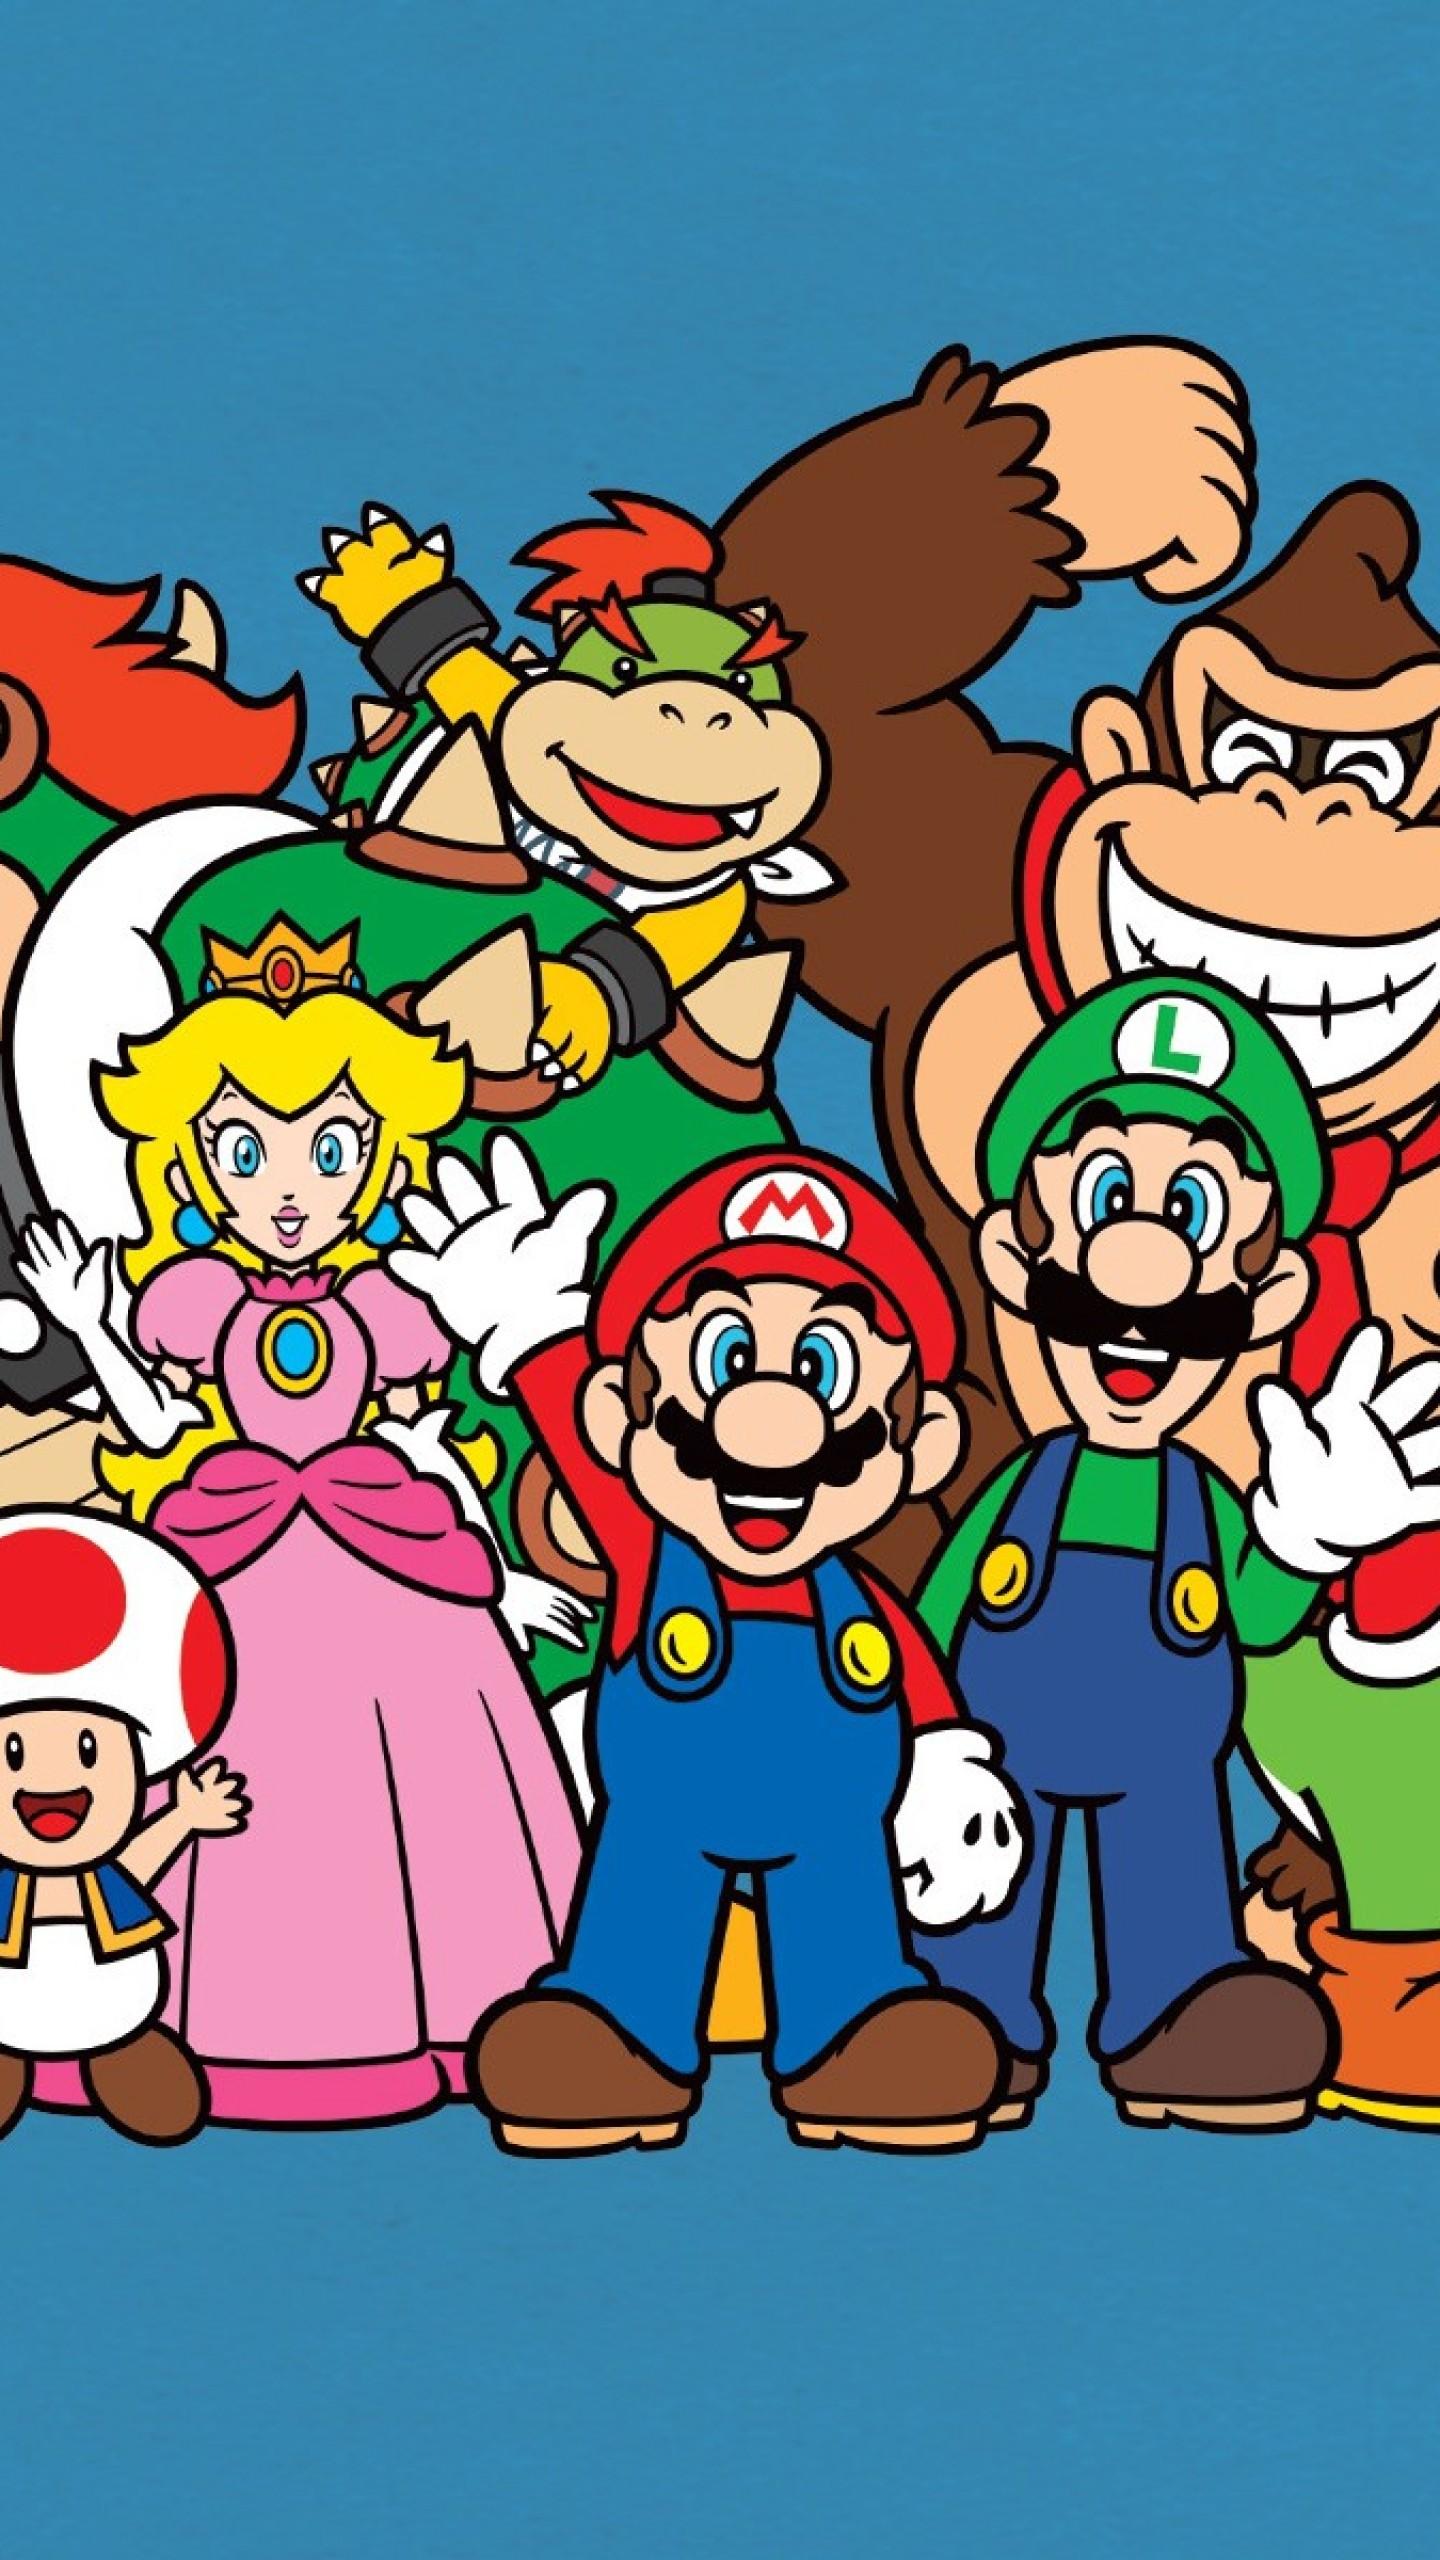 Preview wallpaper mario bros, luigi, yoshi, princess peach, donkey kong,  toad